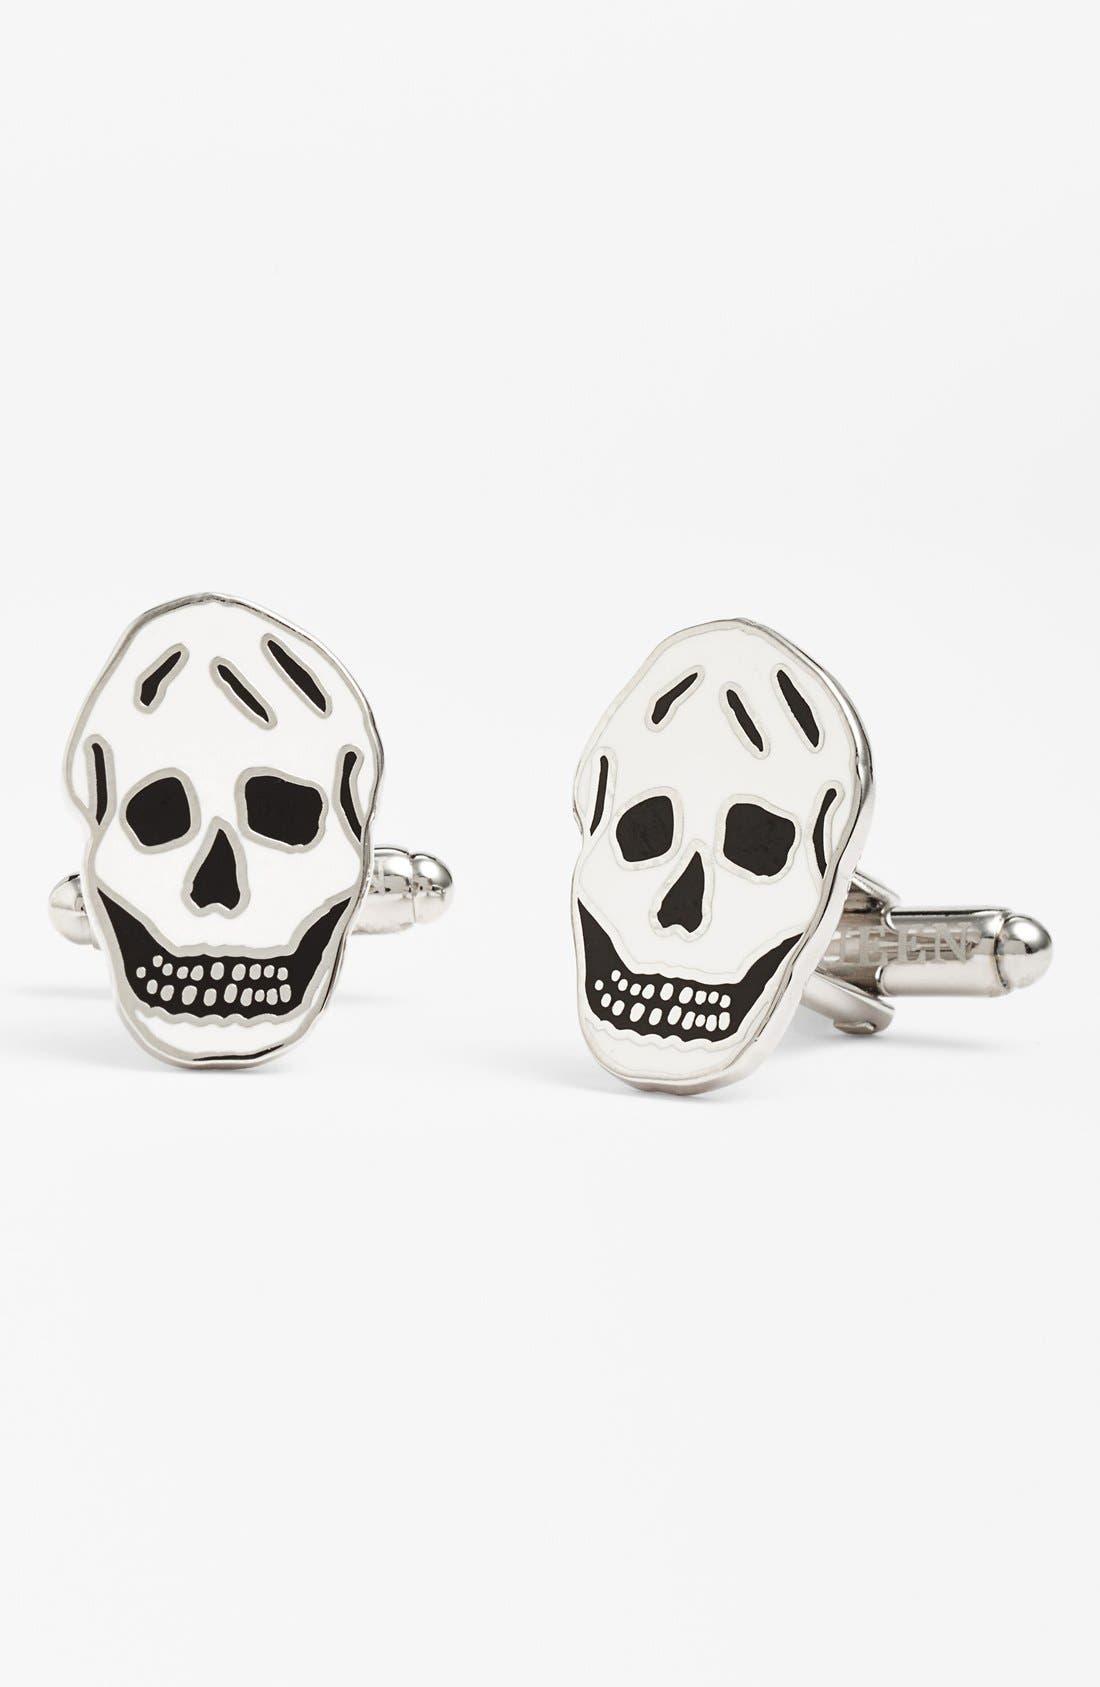 Brass Skull Cuff Links,                             Main thumbnail 1, color,                             BLACK/WHITE